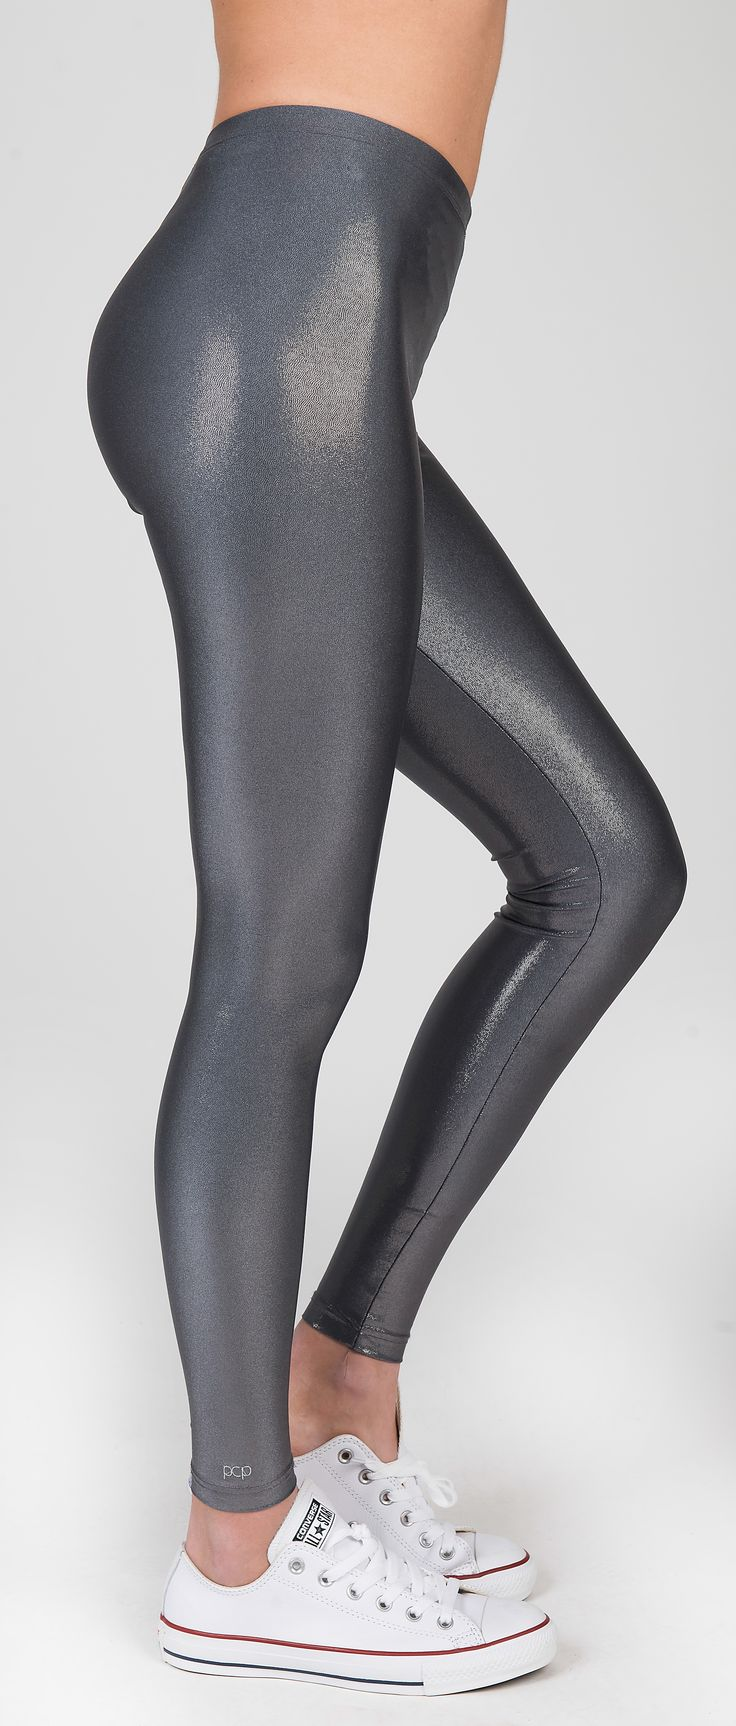 PCP Oblivion - grey glitter leggings